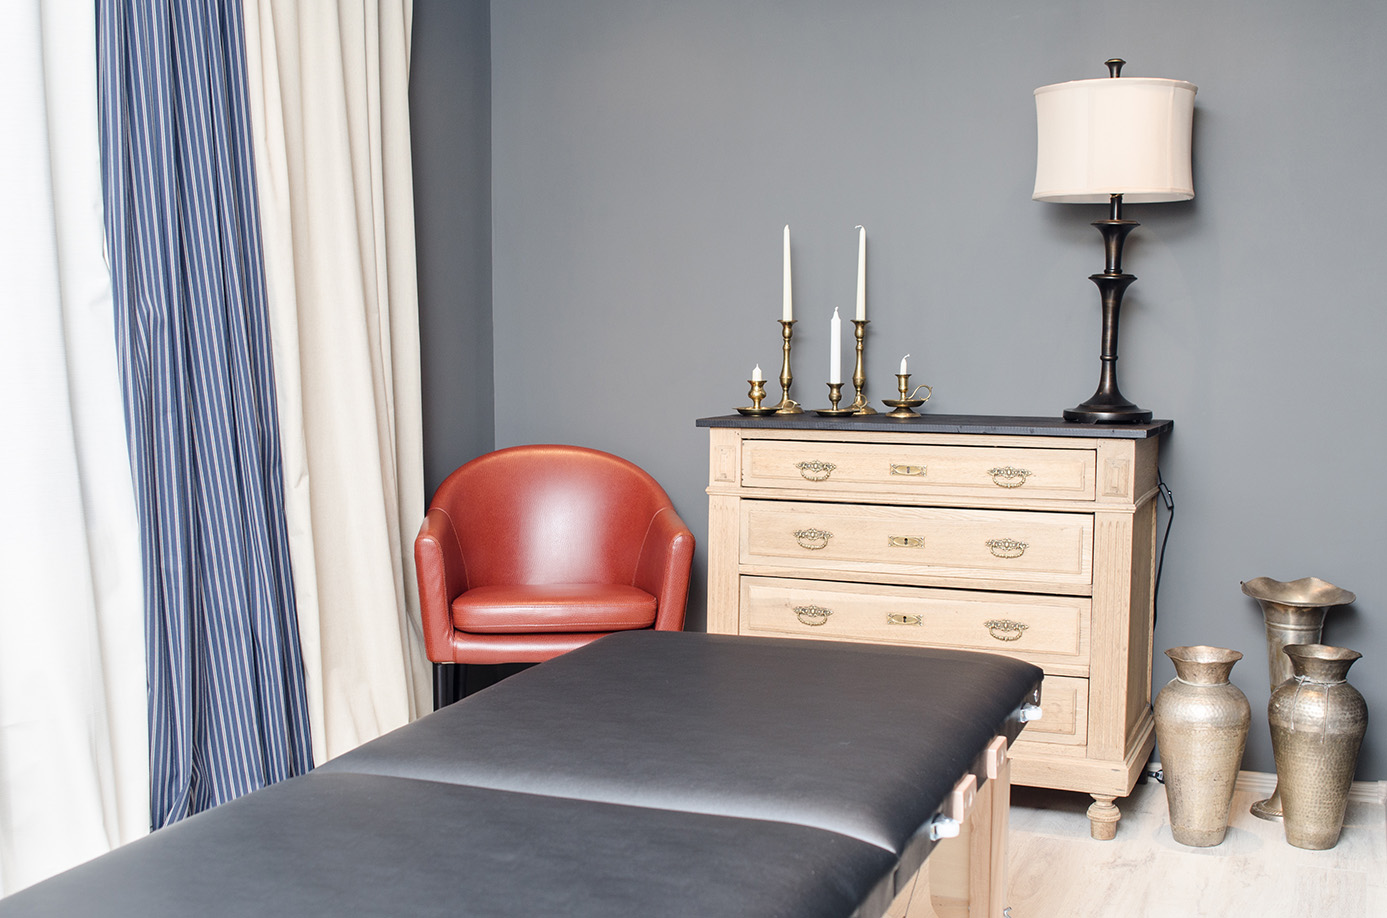 Terapii complementare - Dana Ciungradi